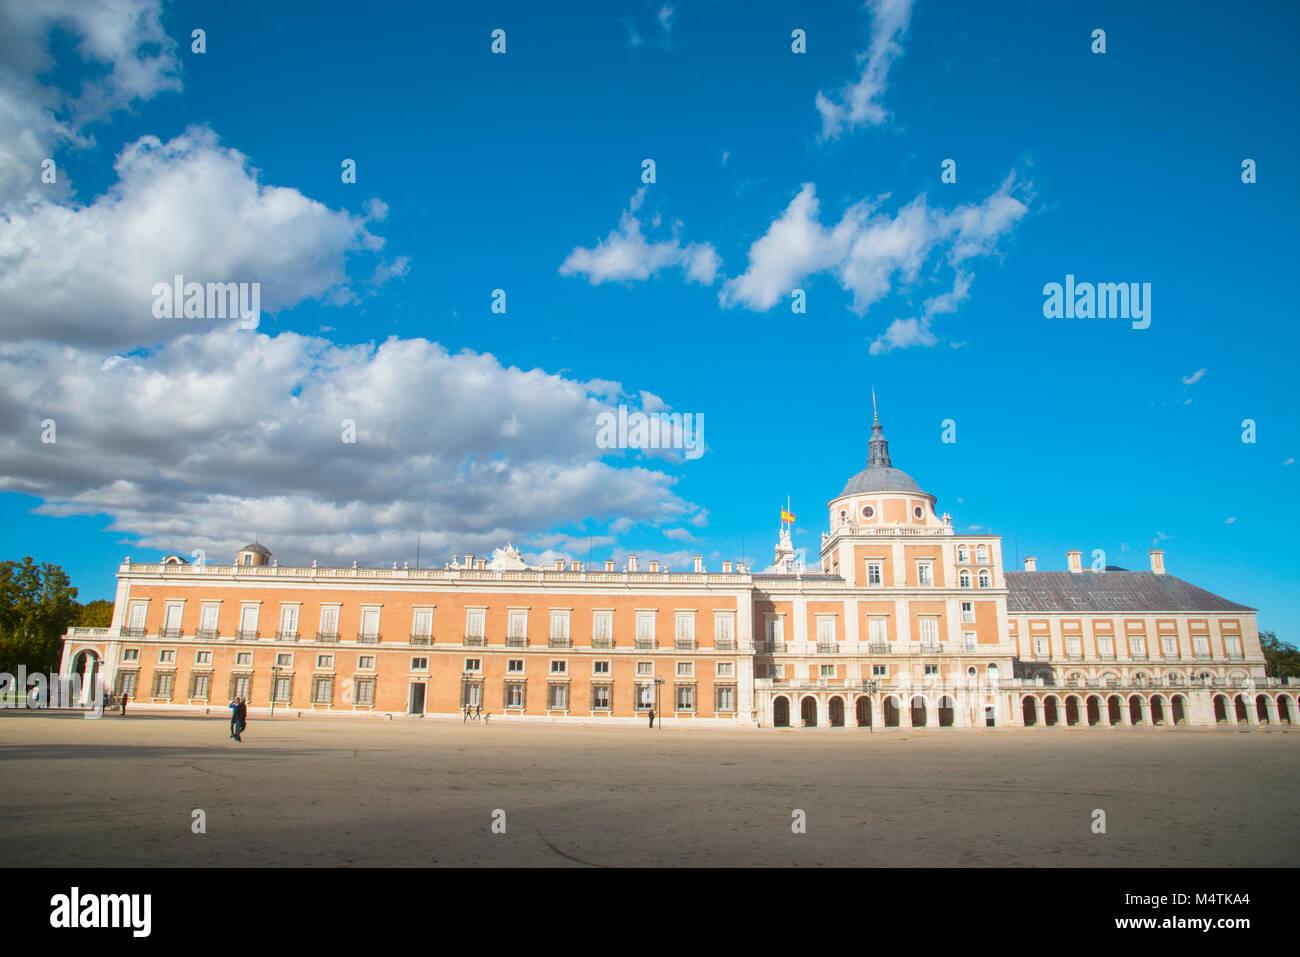 Facade of Royal Palace. Aranjuez, Madrid province, Spain. - Stock Image